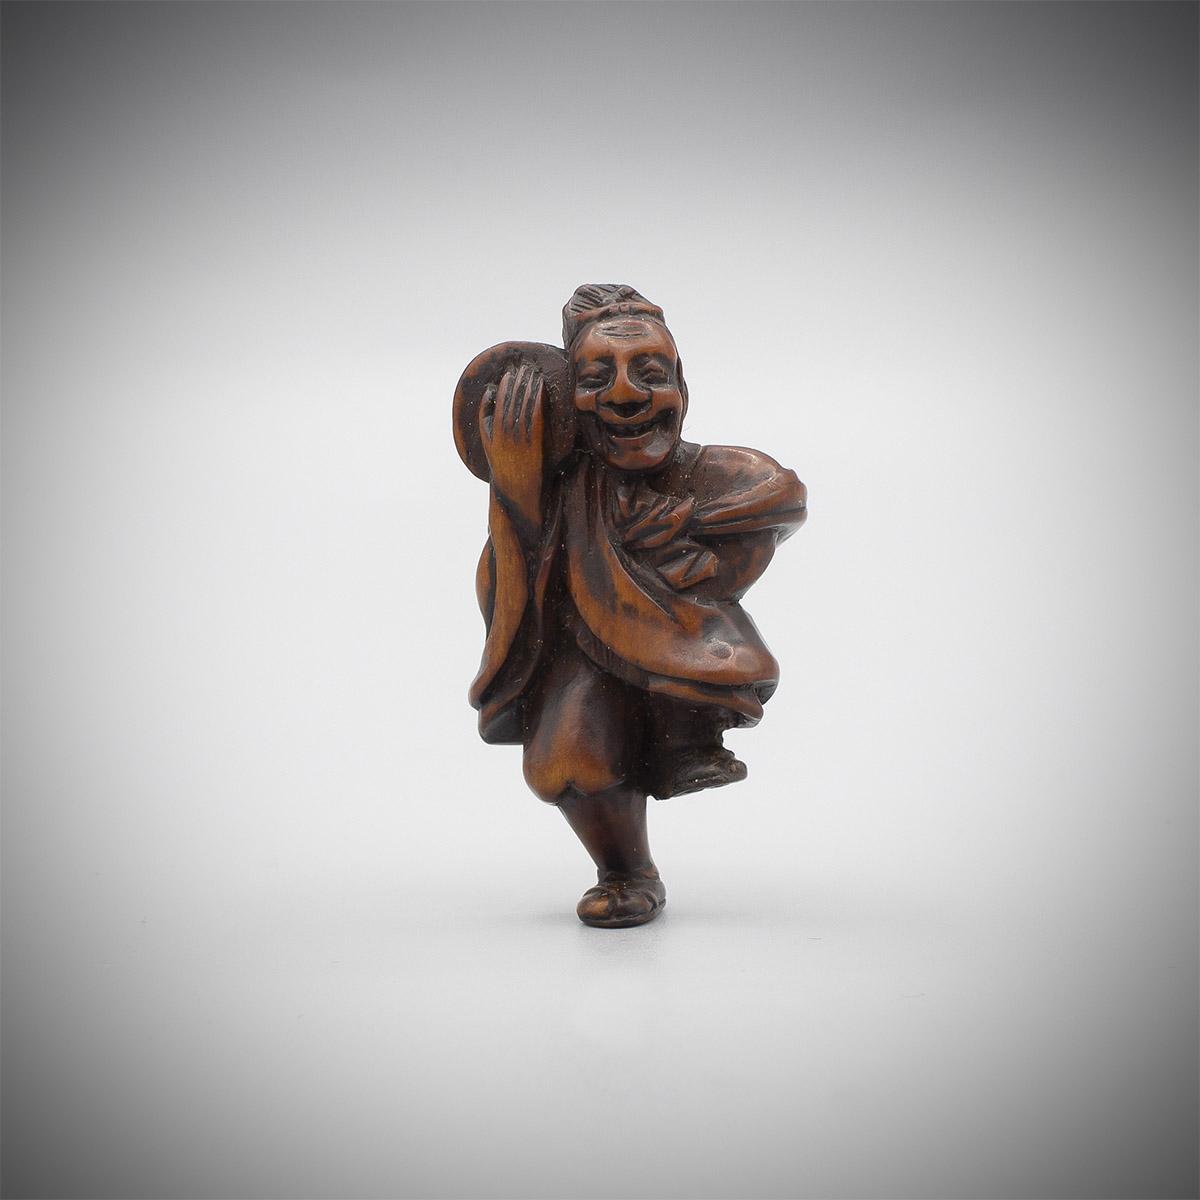 Wood Netsuke of a Performer, MR3533_v.1